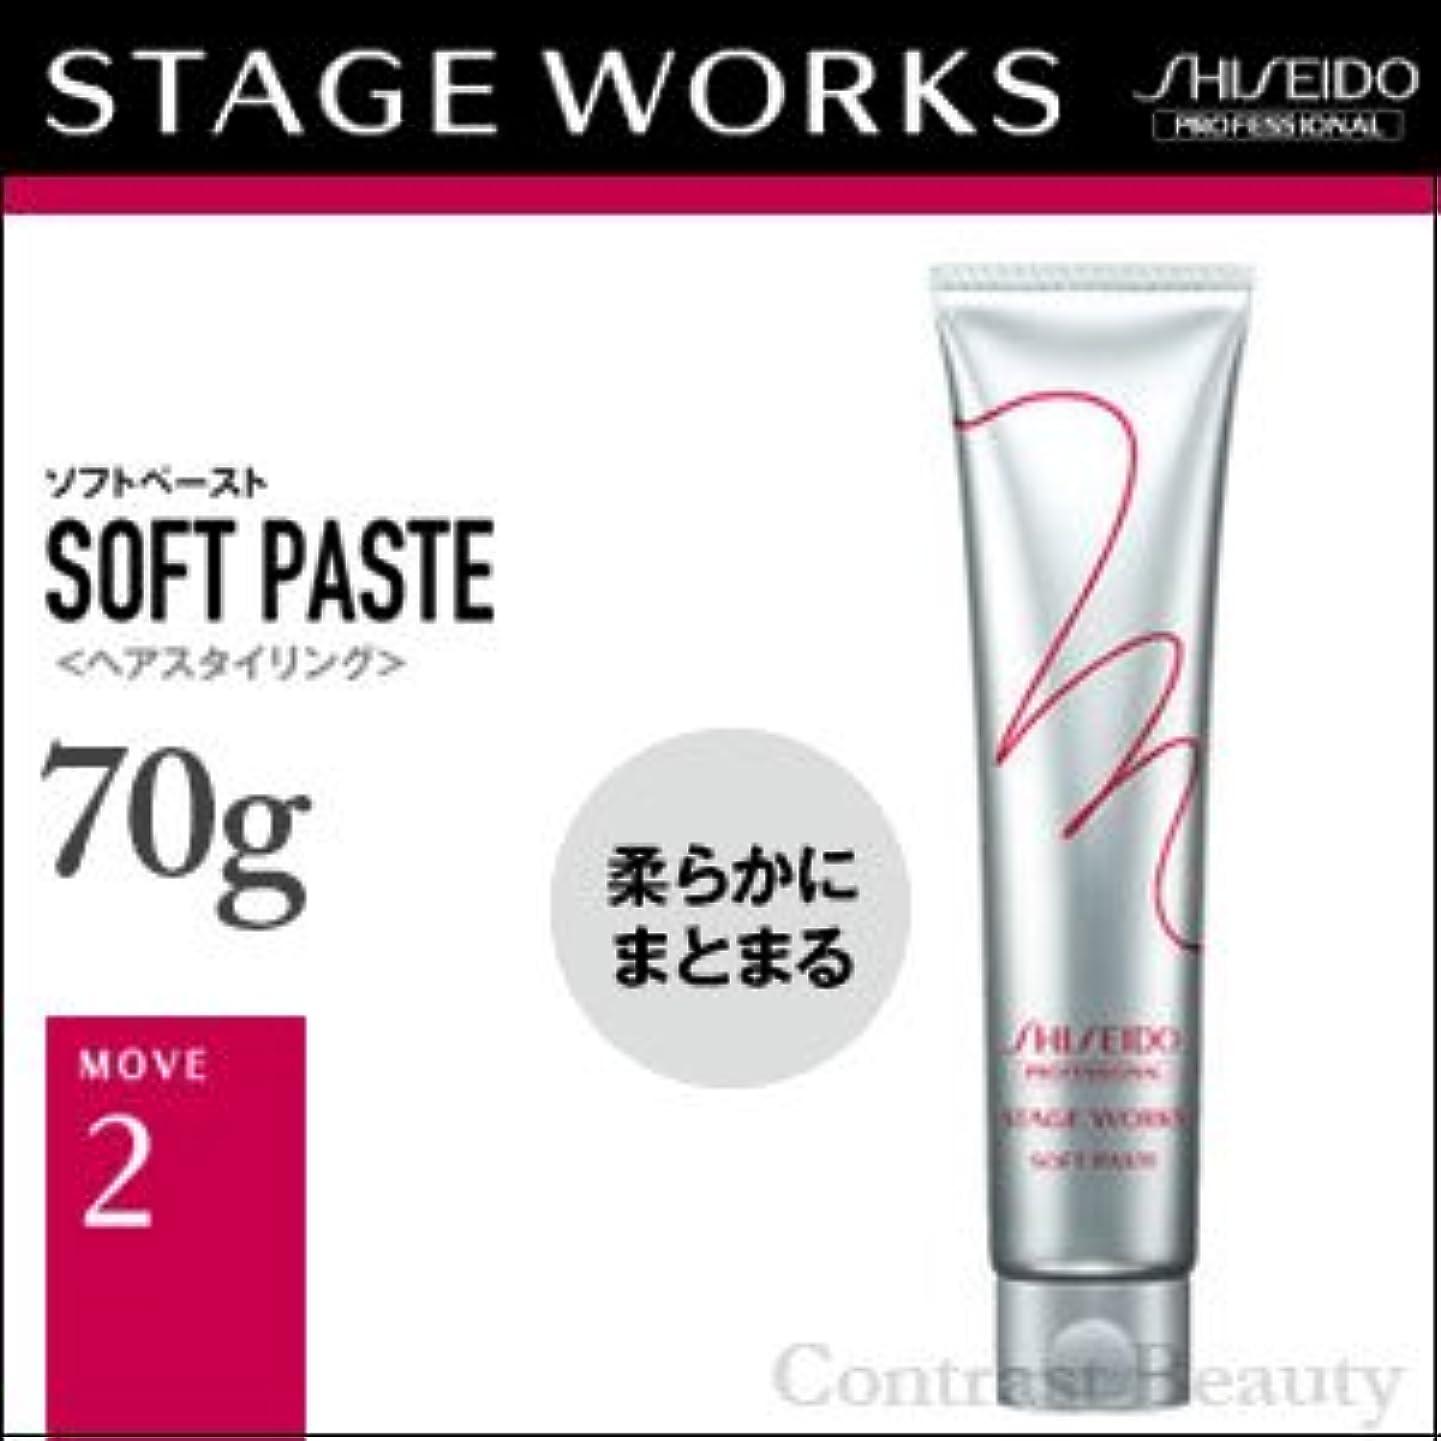 【x5個セット】 資生堂 ステージワークス ムーブ2 ソフトペースト 70g